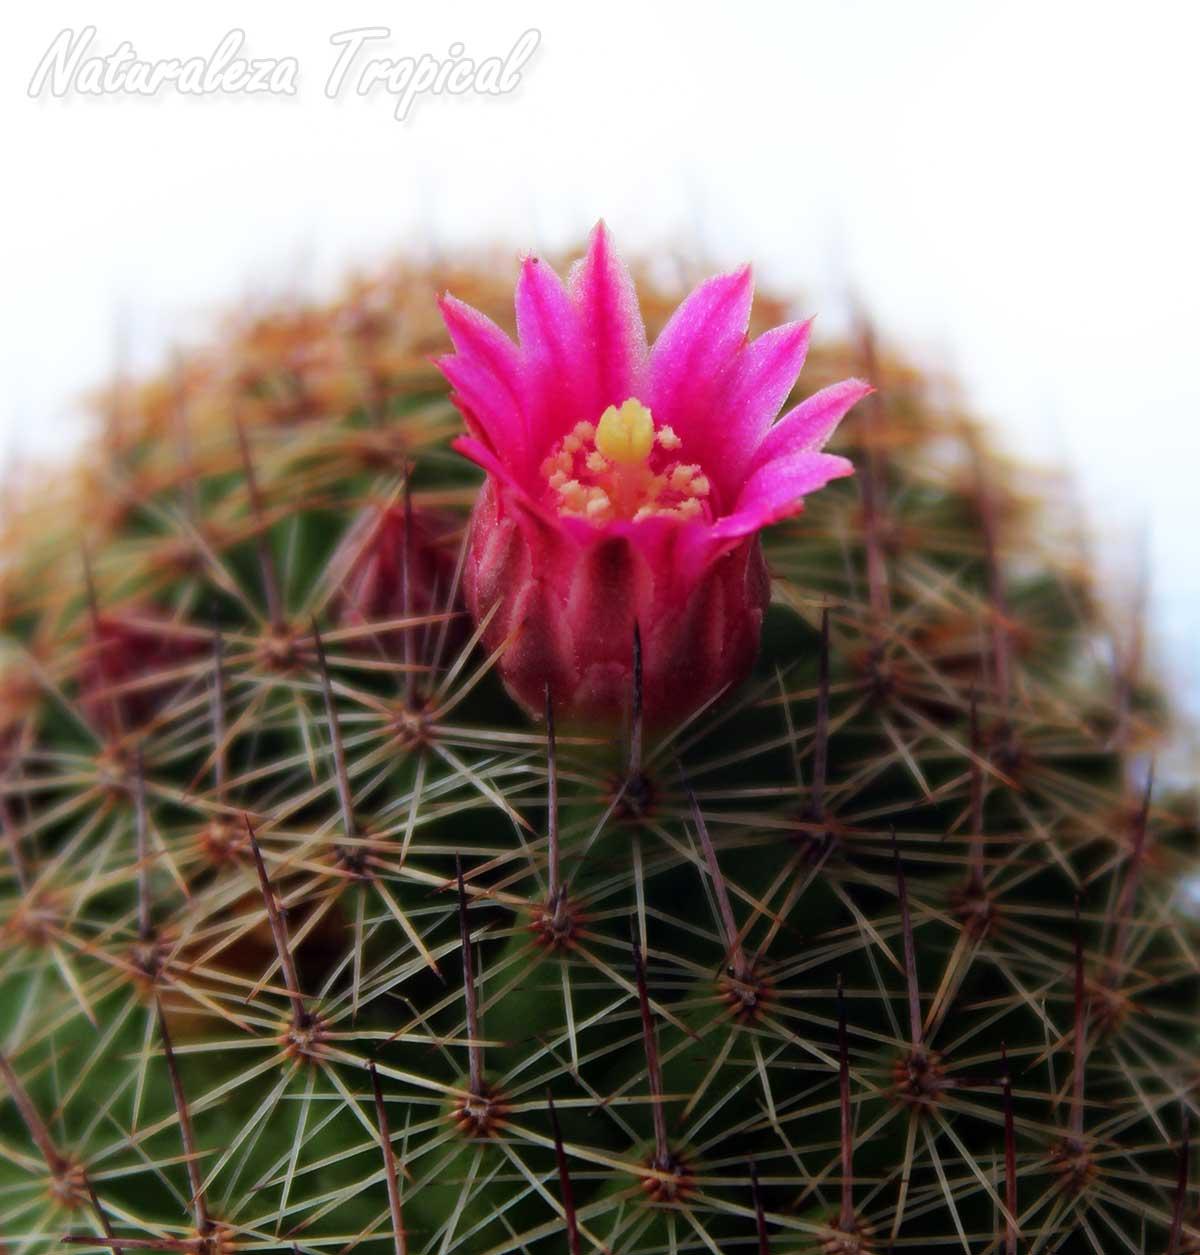 Detalles del tallo y flores del cactus Mammillaria matudae